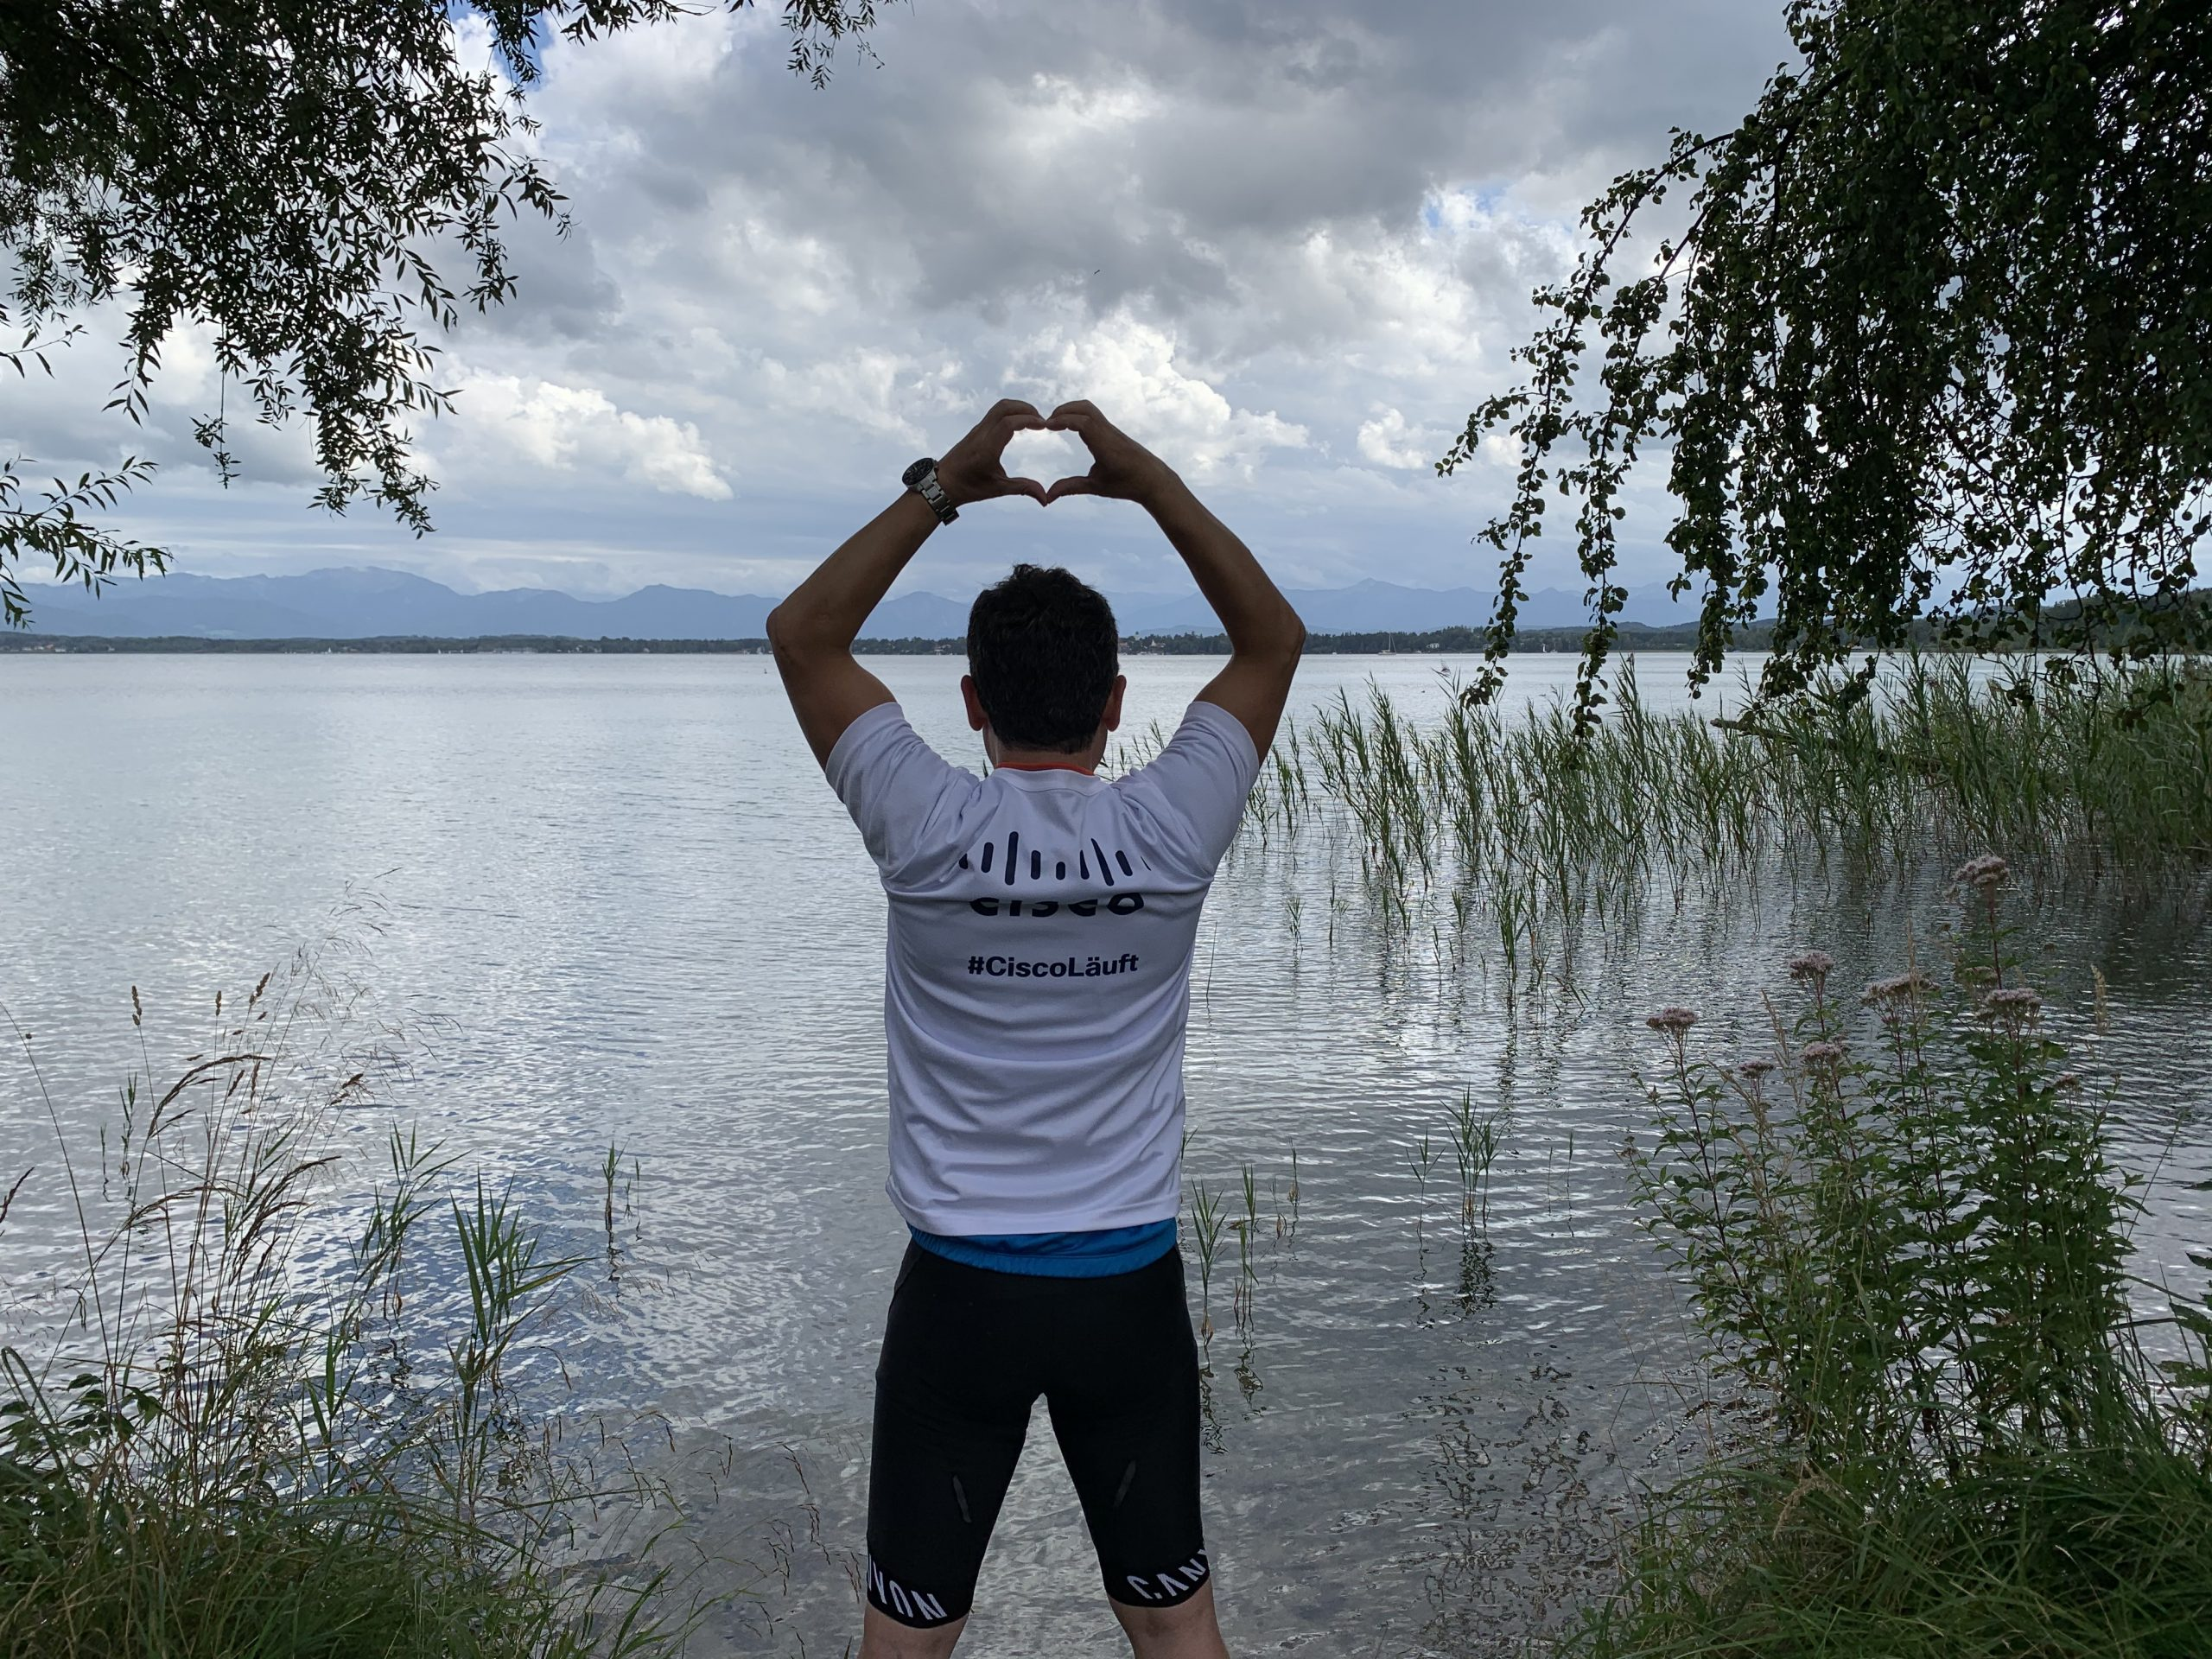 Ahmet in front of water in his Cisco Lauft shirt